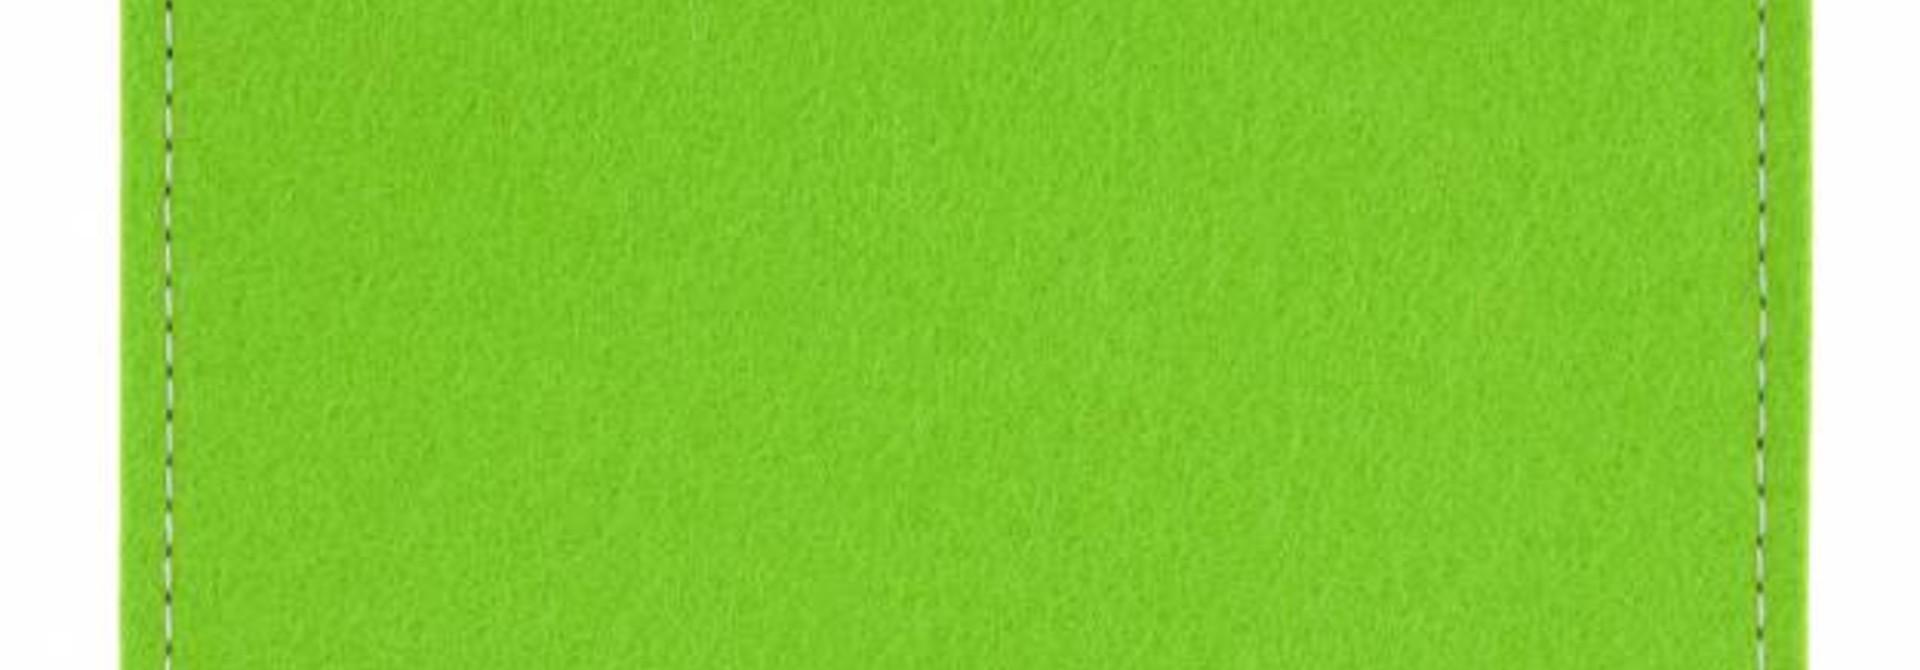 Iconia Sleeve Maigrün